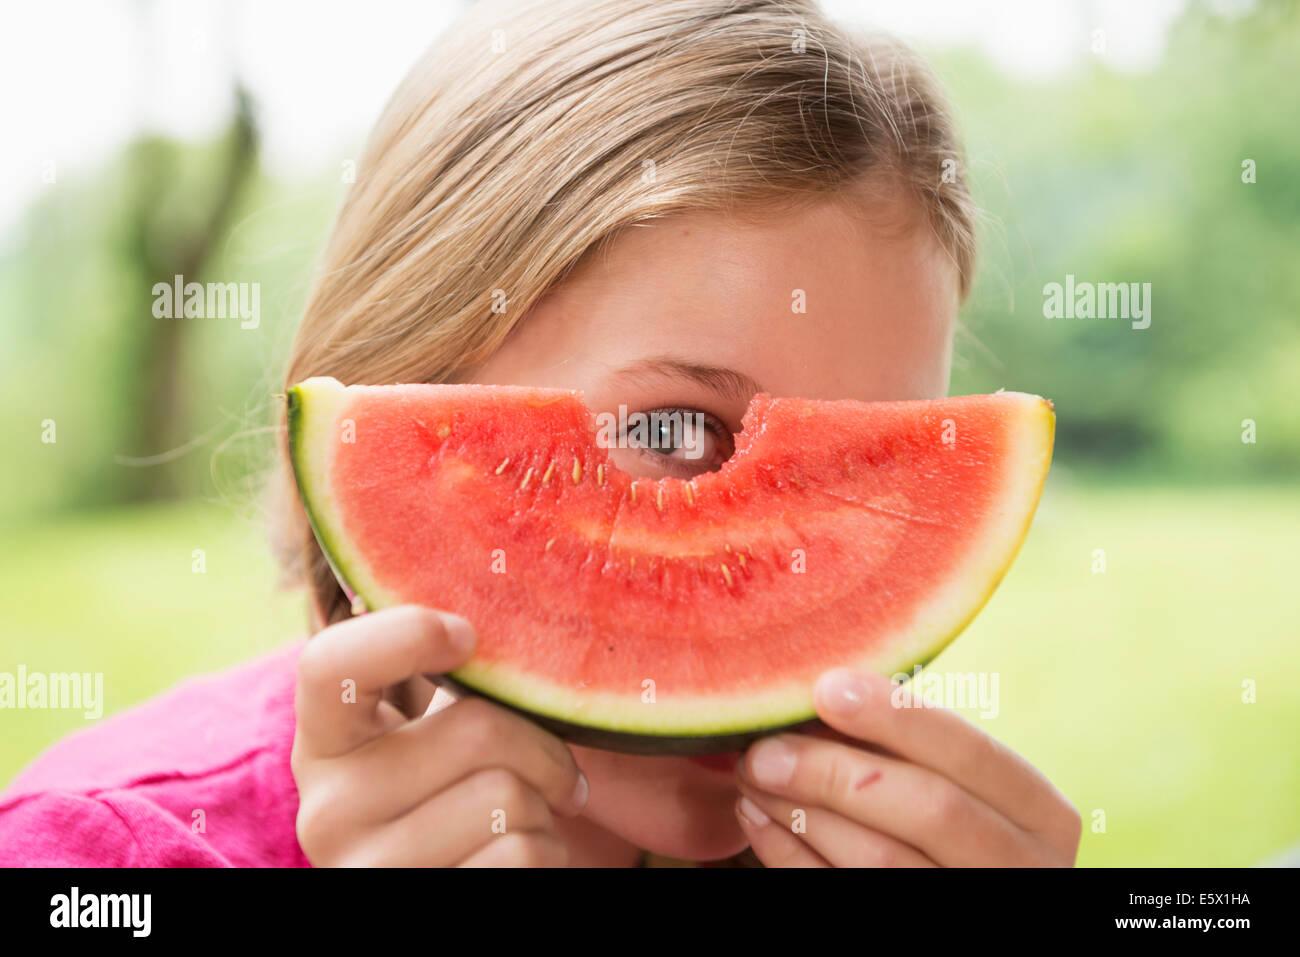 Close up portrait of girl peering through watermelon slice - Stock Image